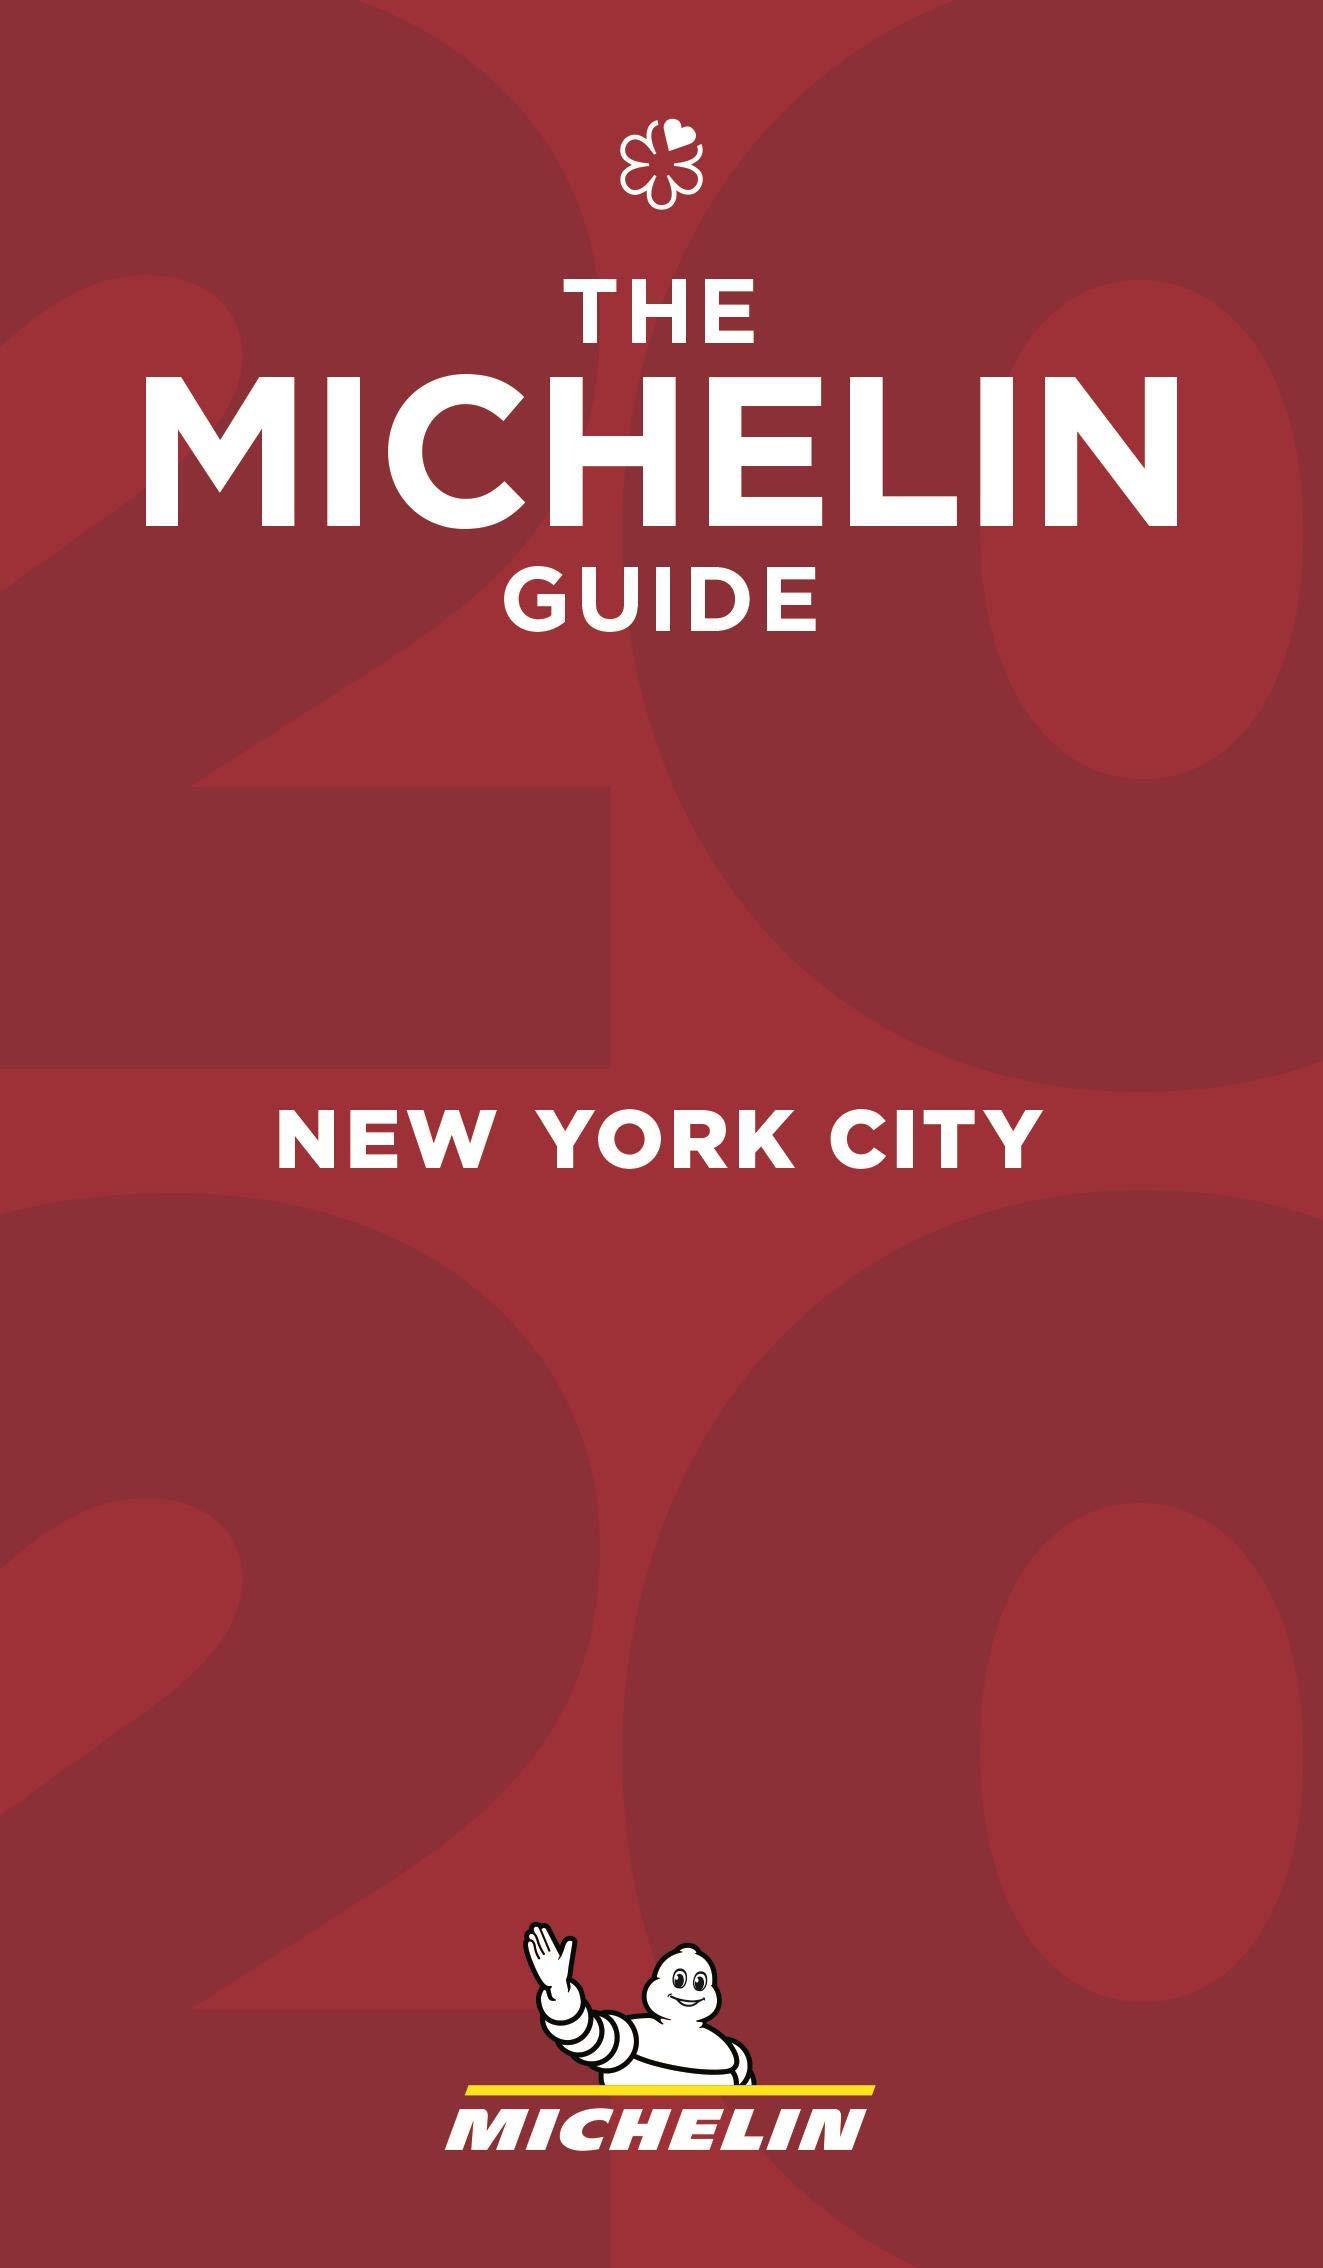 Michelin Guide New York City 2019 Restaurants Michelin Red Guide